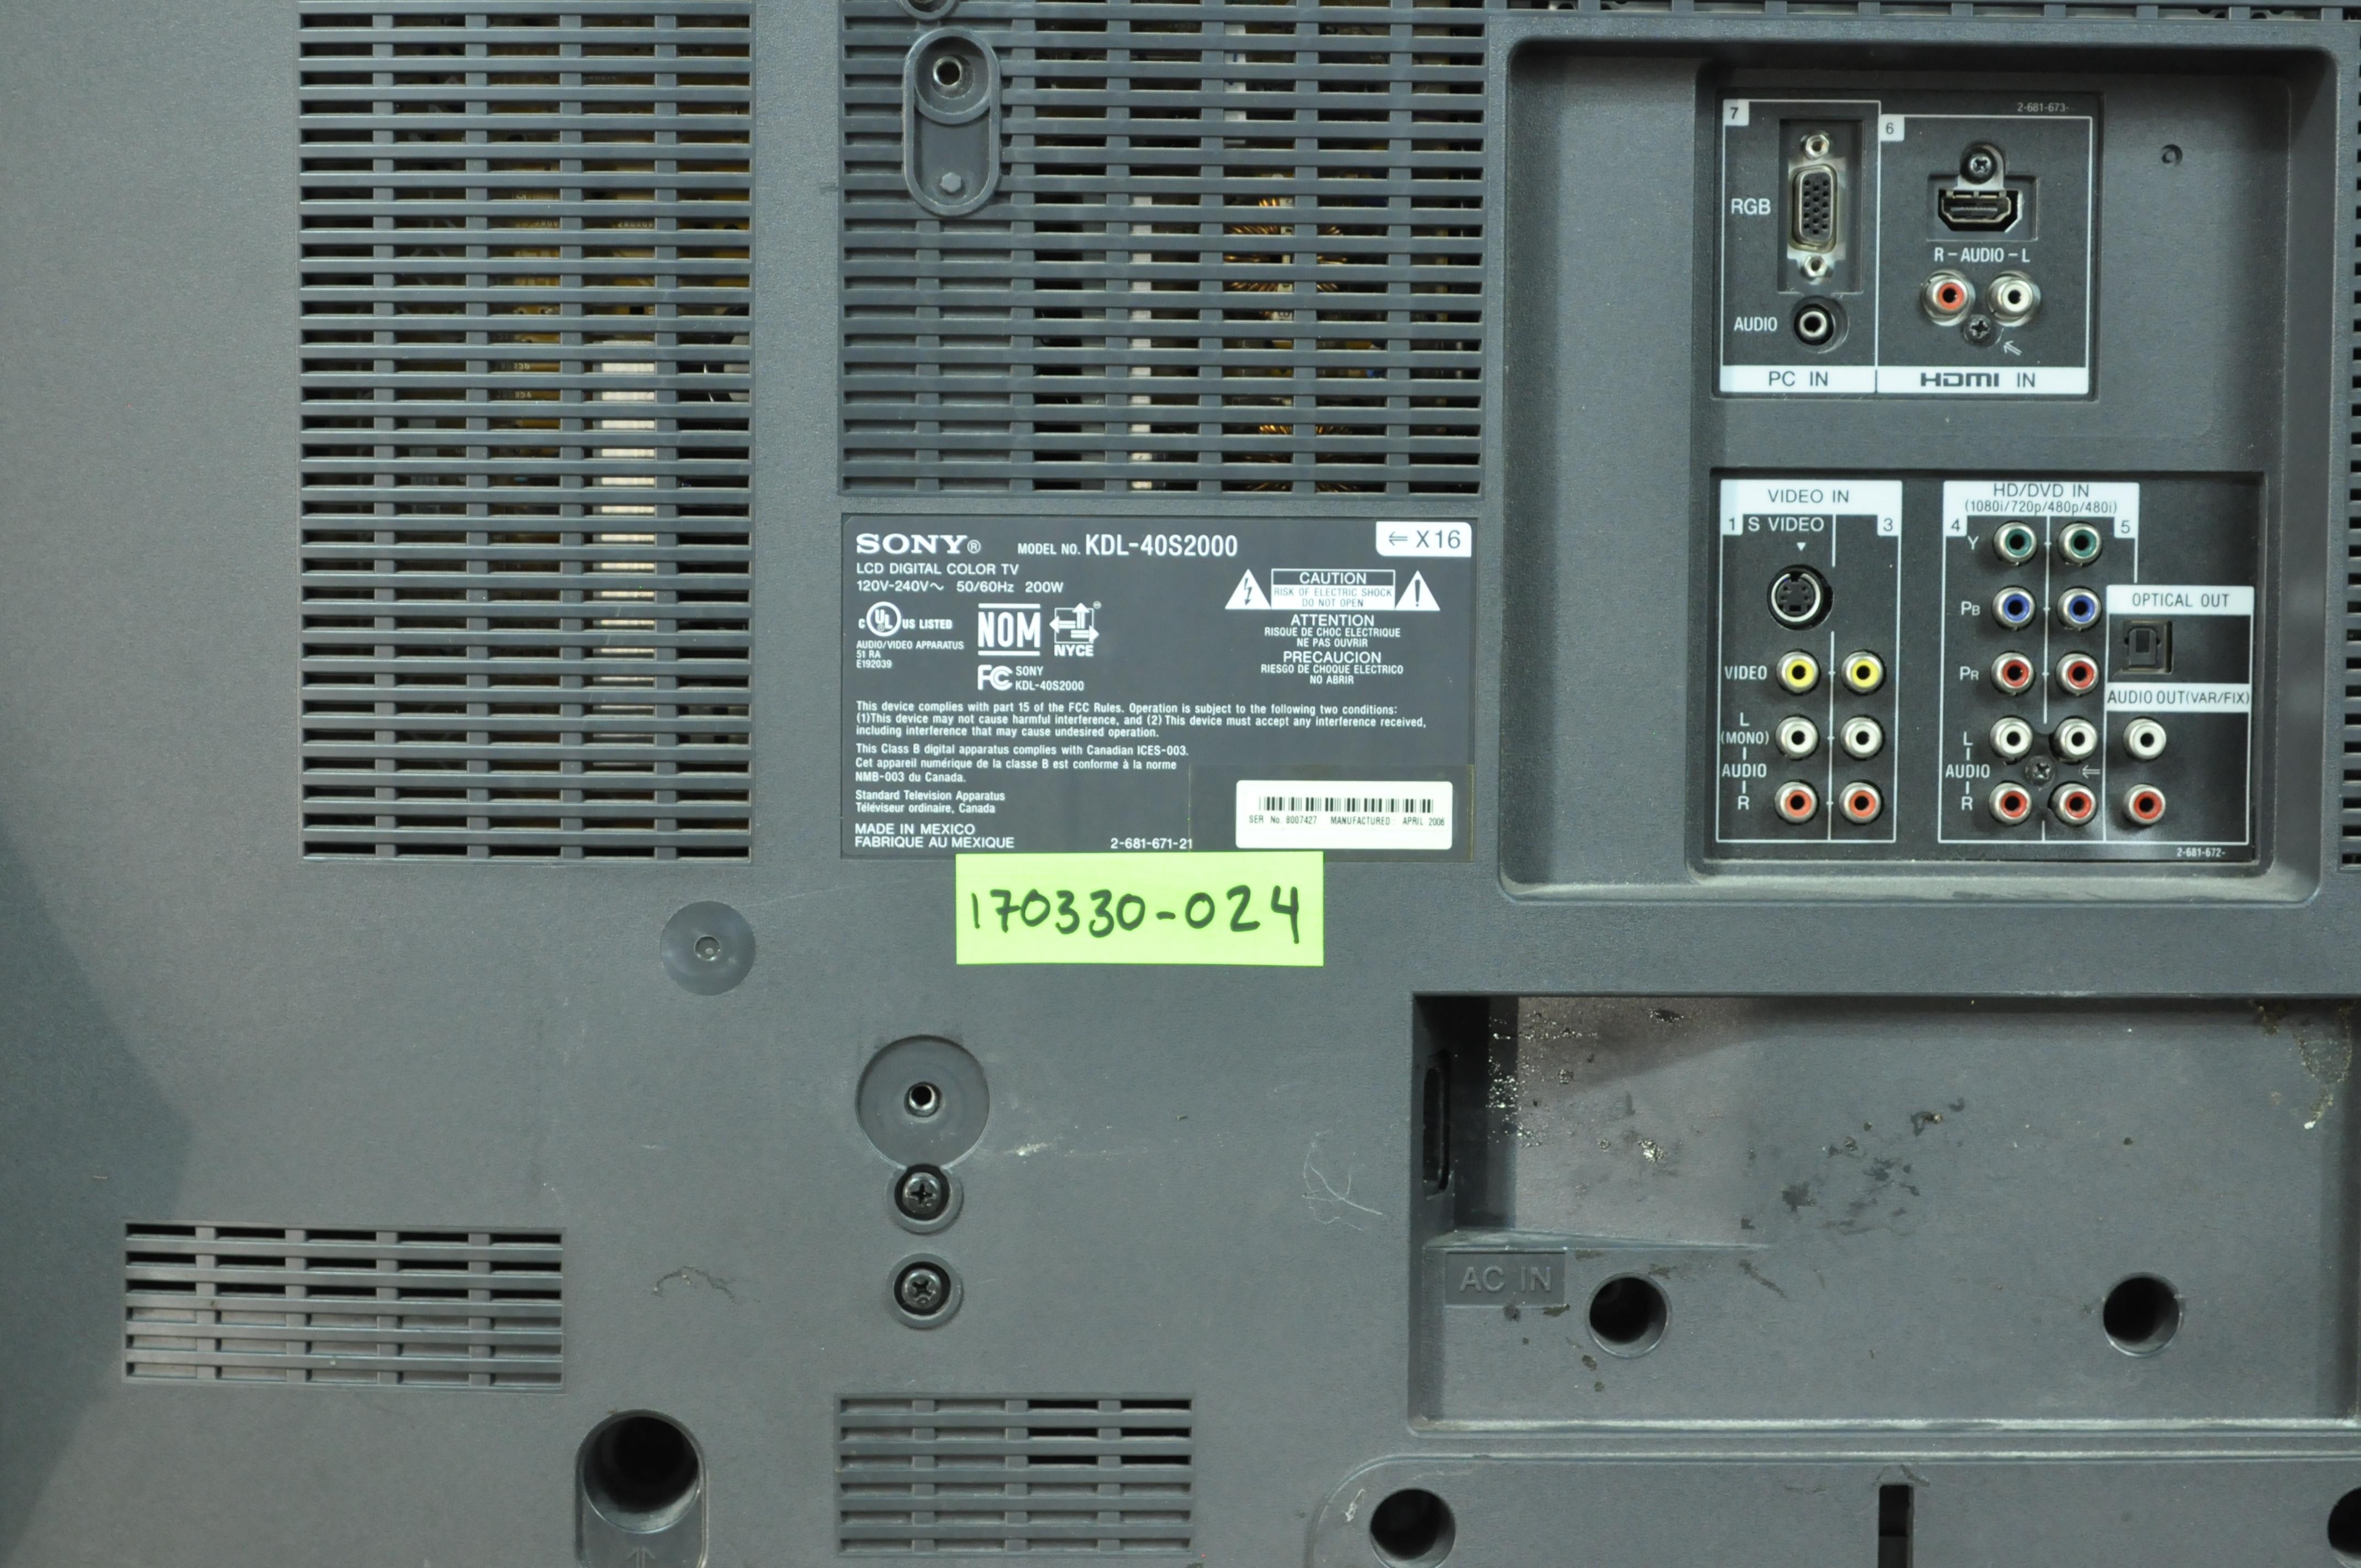 SONY KDL-40S2000 Small Parts Repair Kit QS BOARD